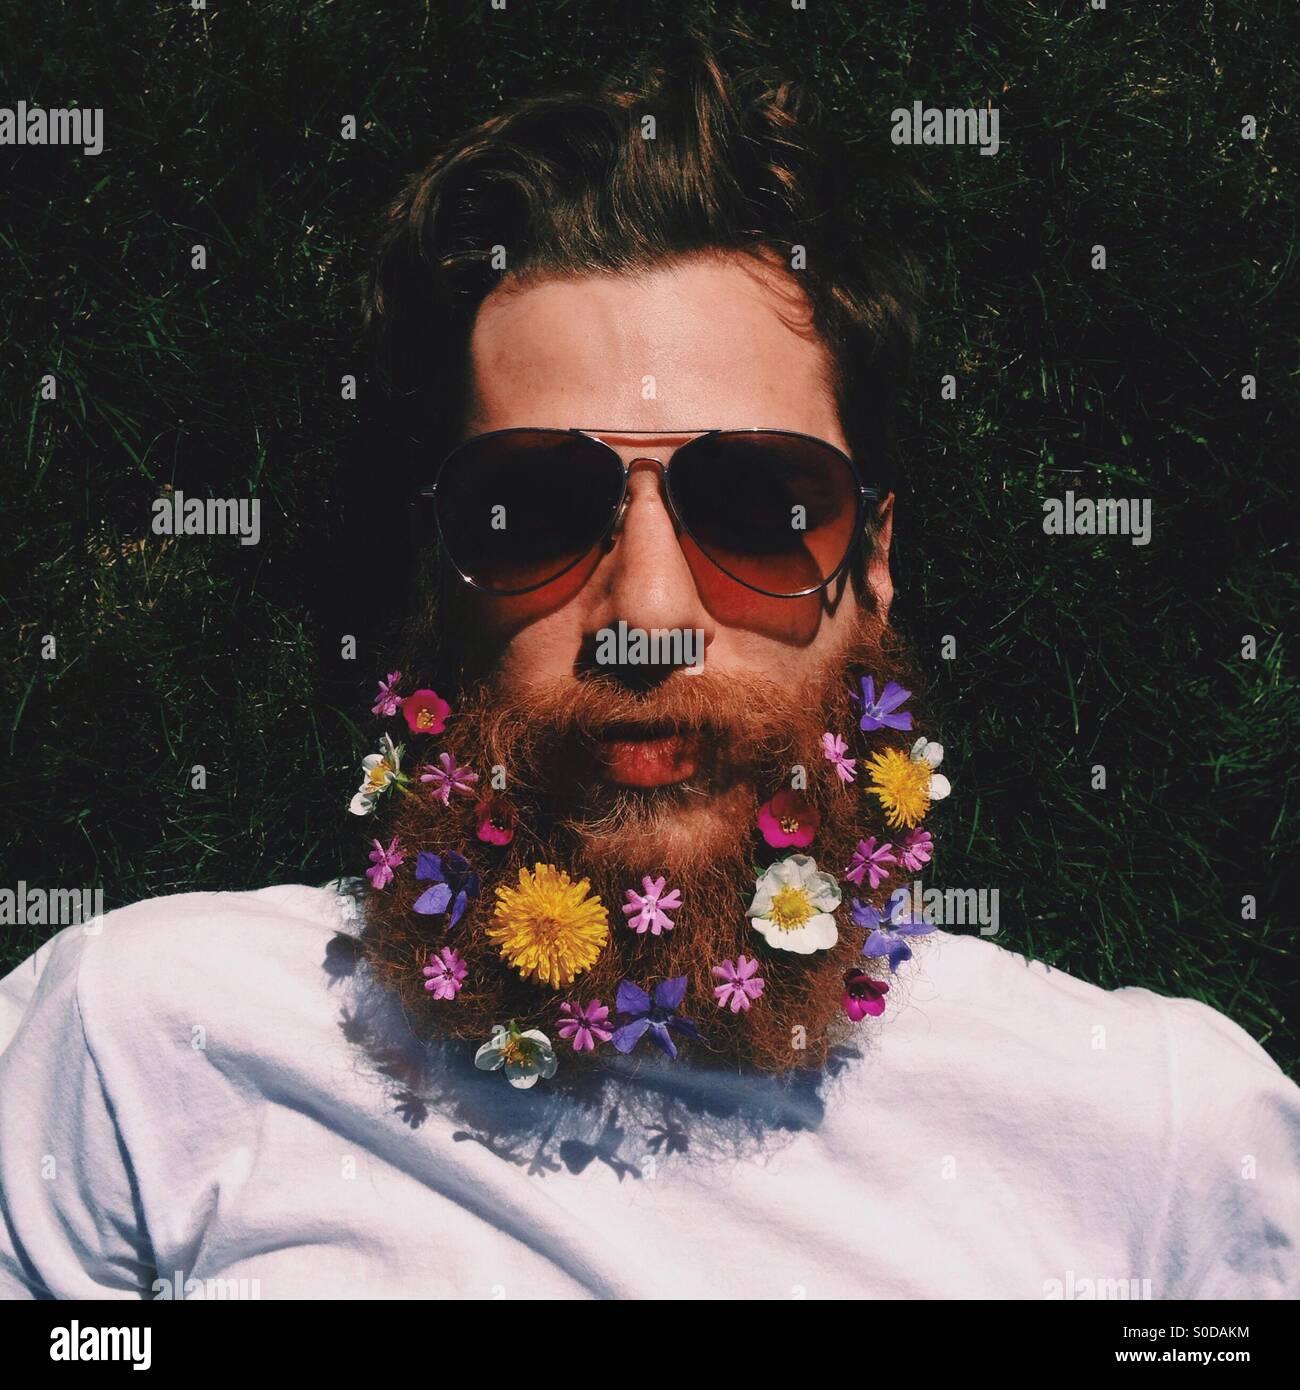 Barbe de fleur Photo Stock